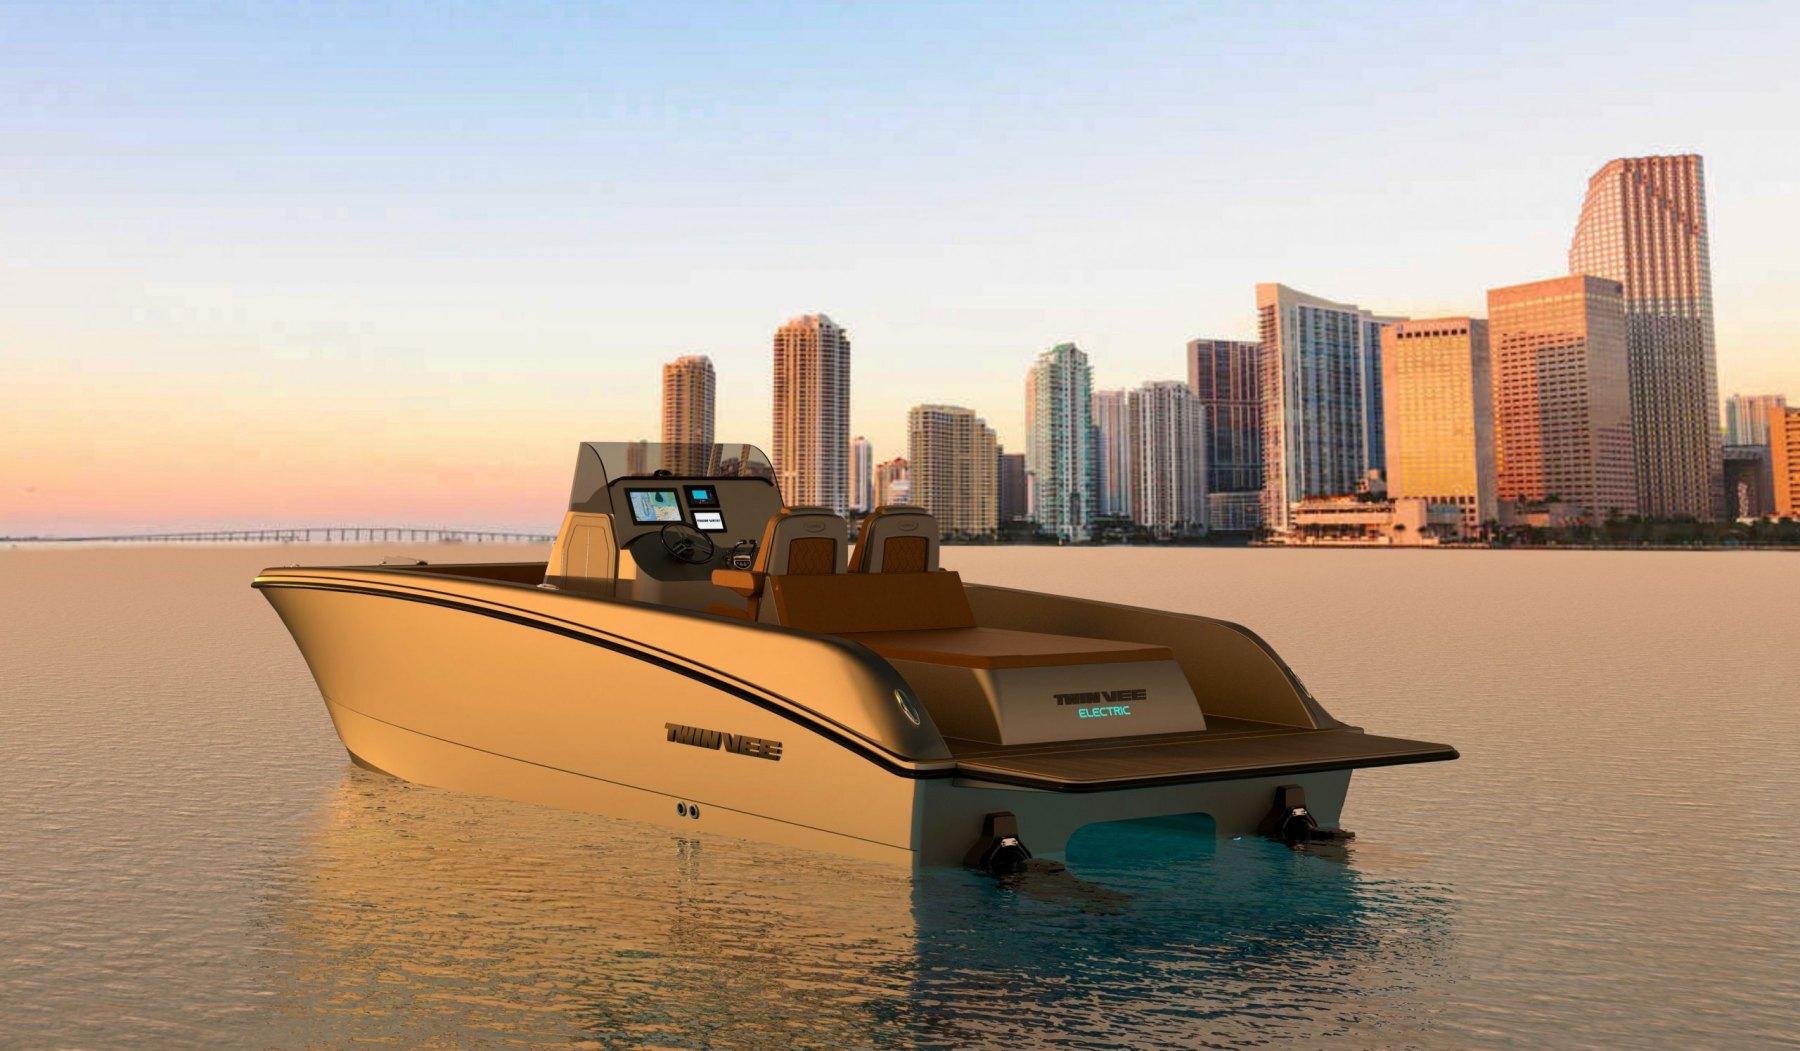 Twin Vee Goes Electric: Sneak Peak Of New Electric-Powered Catamaran Boat thumbnail